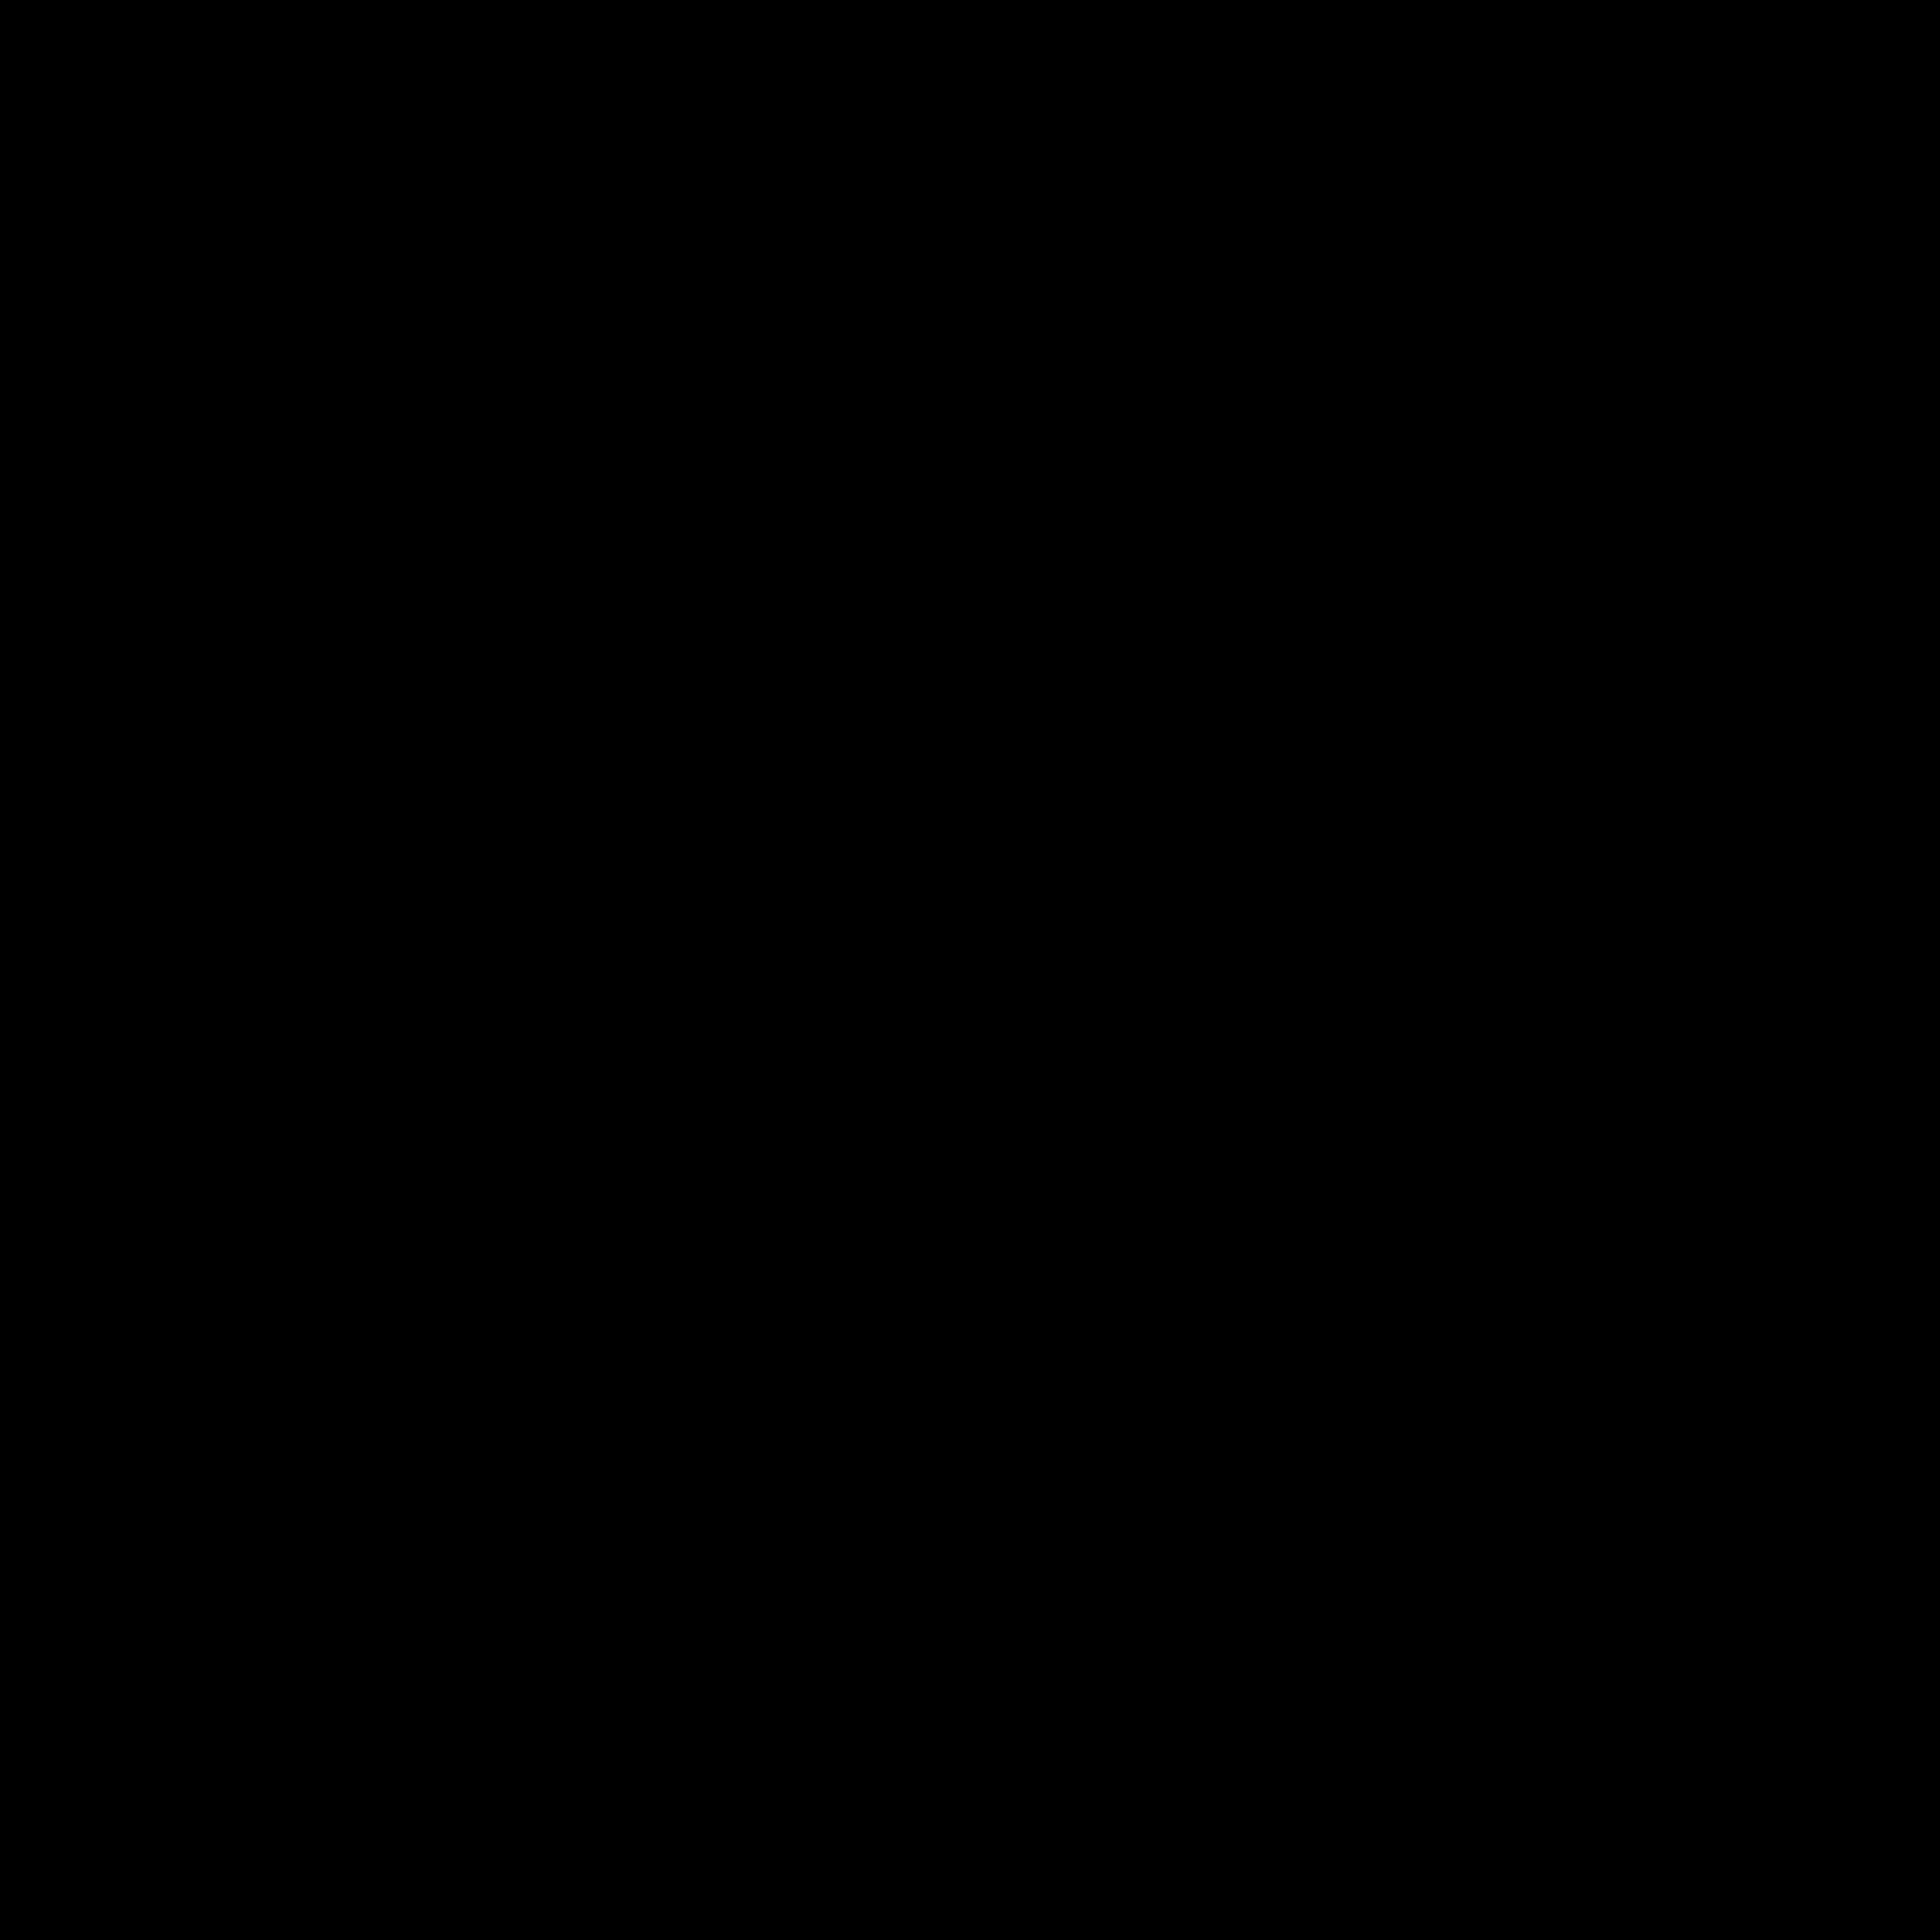 Gewehr CNC Logo